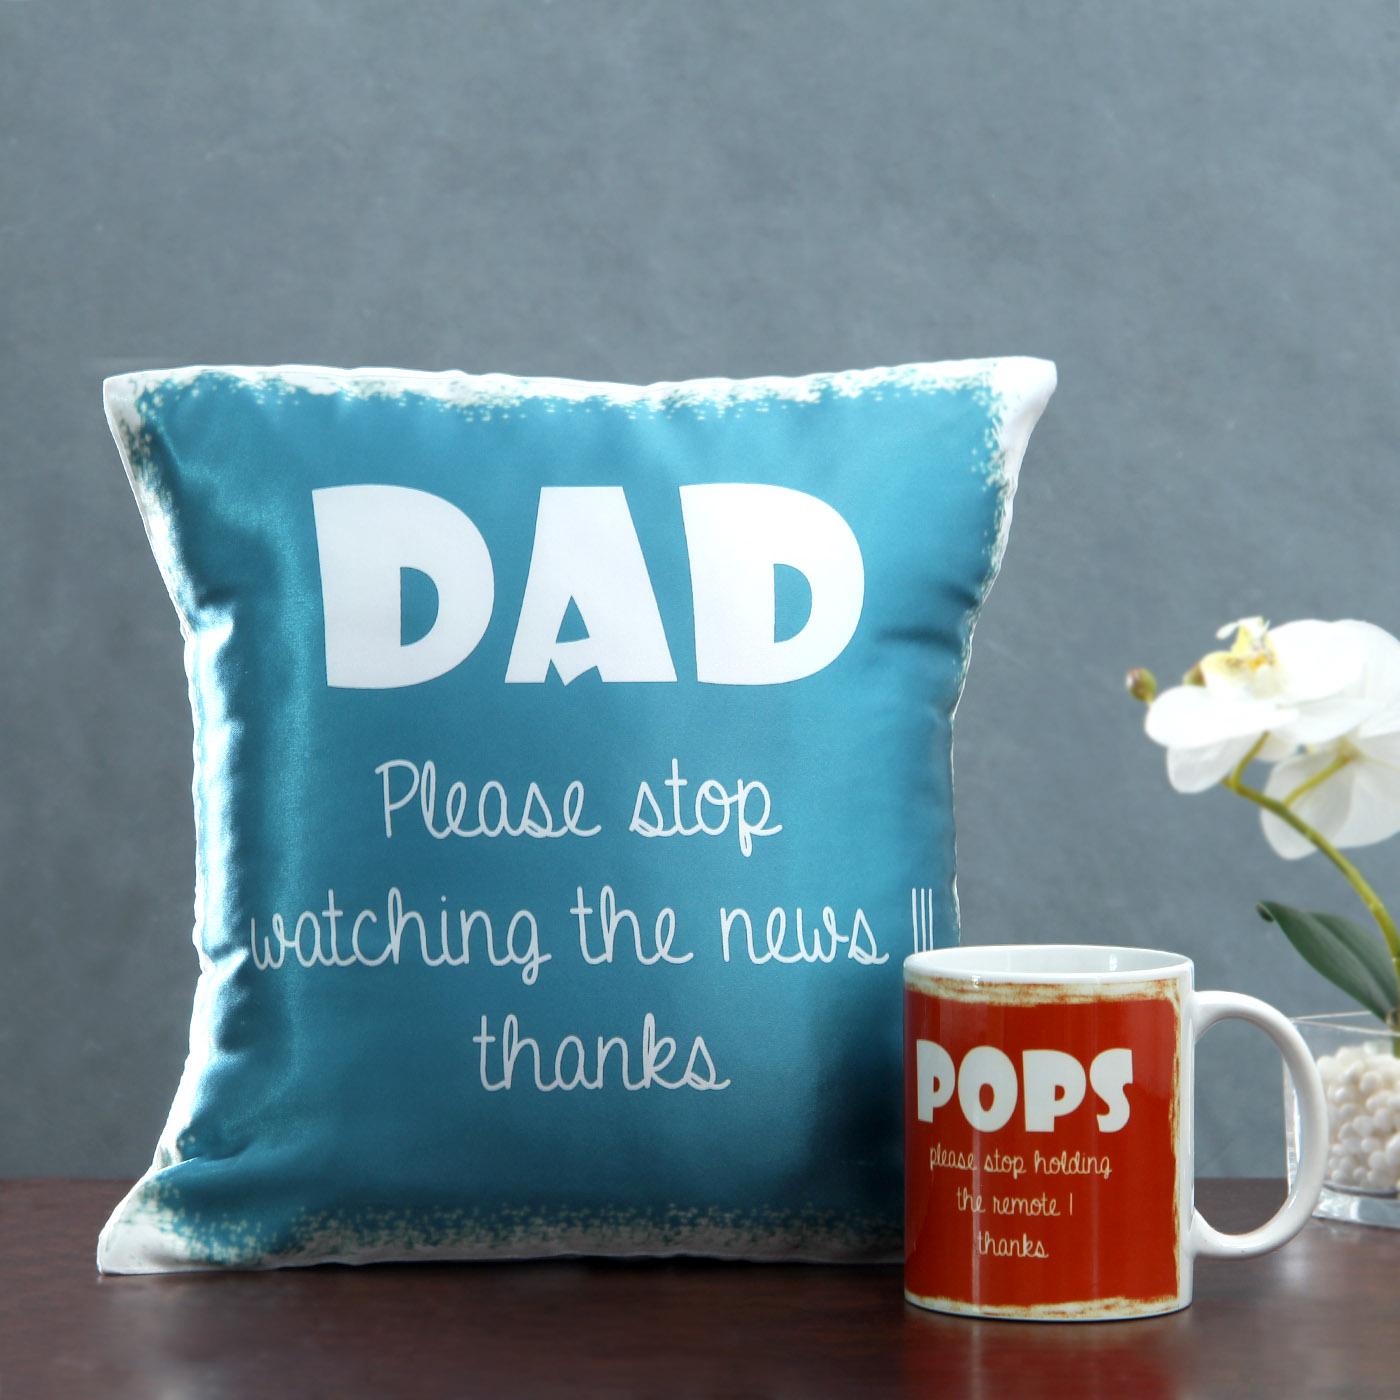 Dad-Satin-Cushion-with-Mug